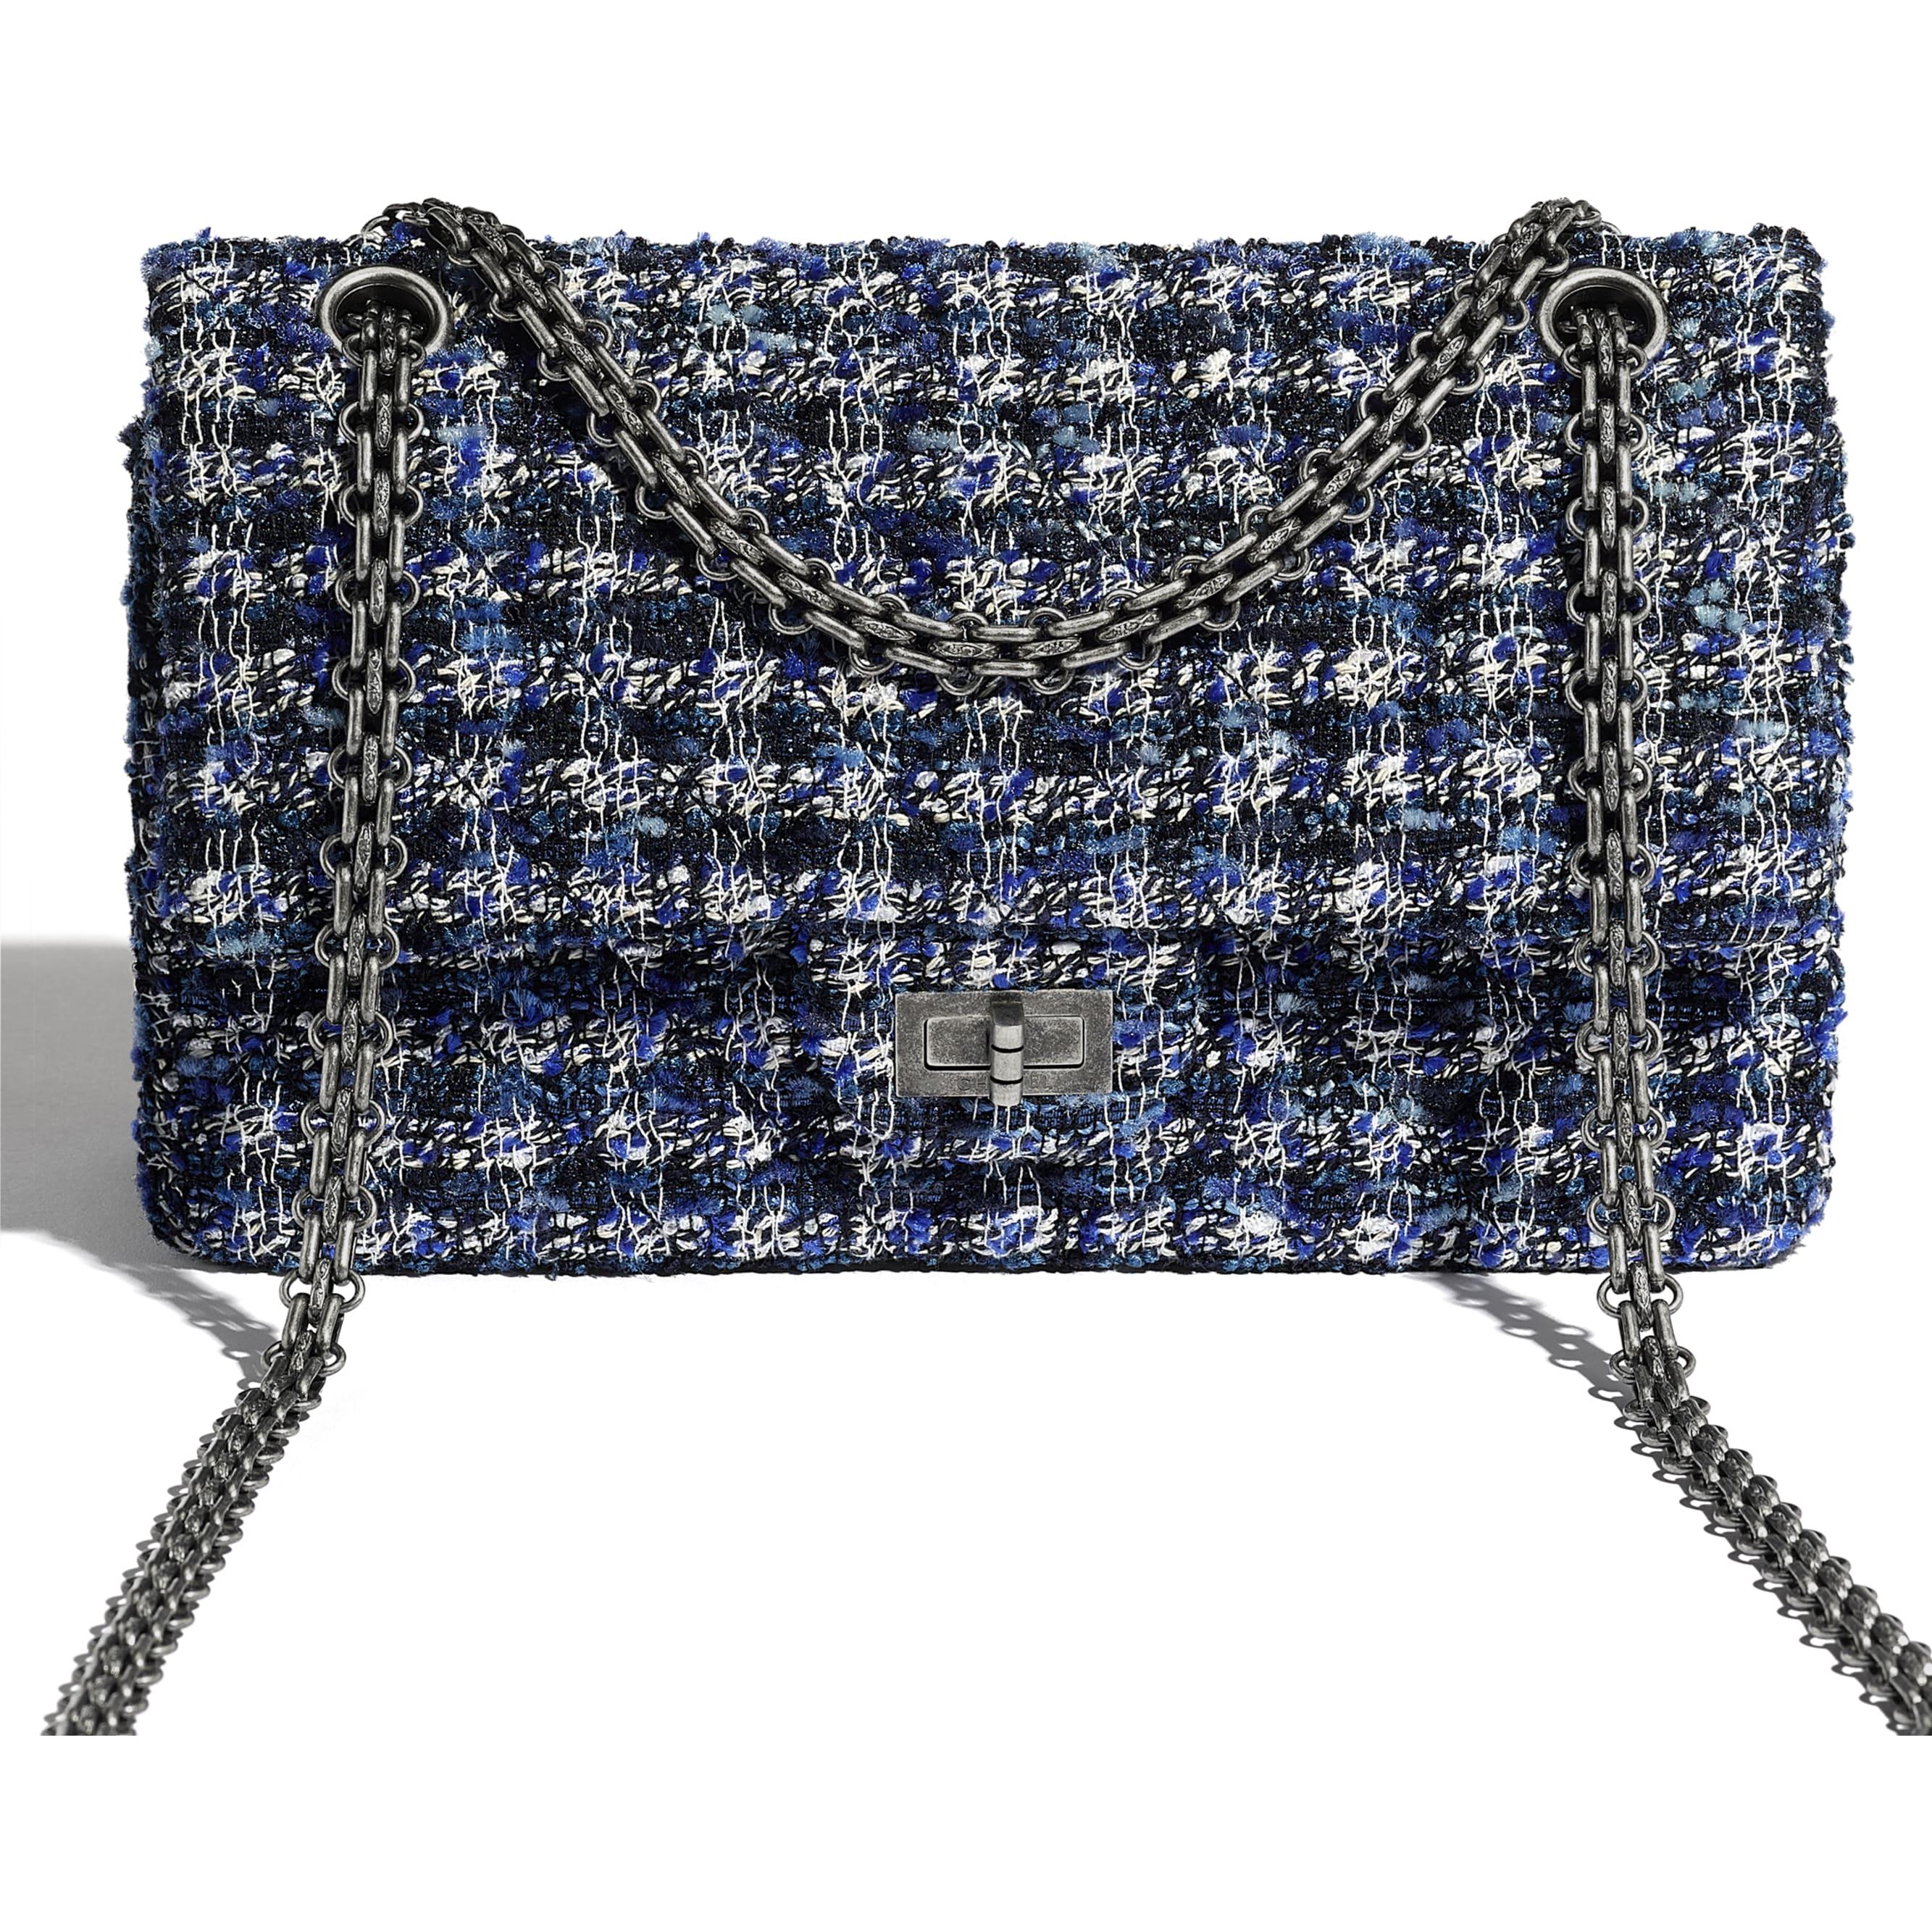 2.55 Handbag - Navy Blue, Blue, Ecru & Black - Tweed & Ruthenium-Finish Metal - CHANEL - Extra view - see standard sized version